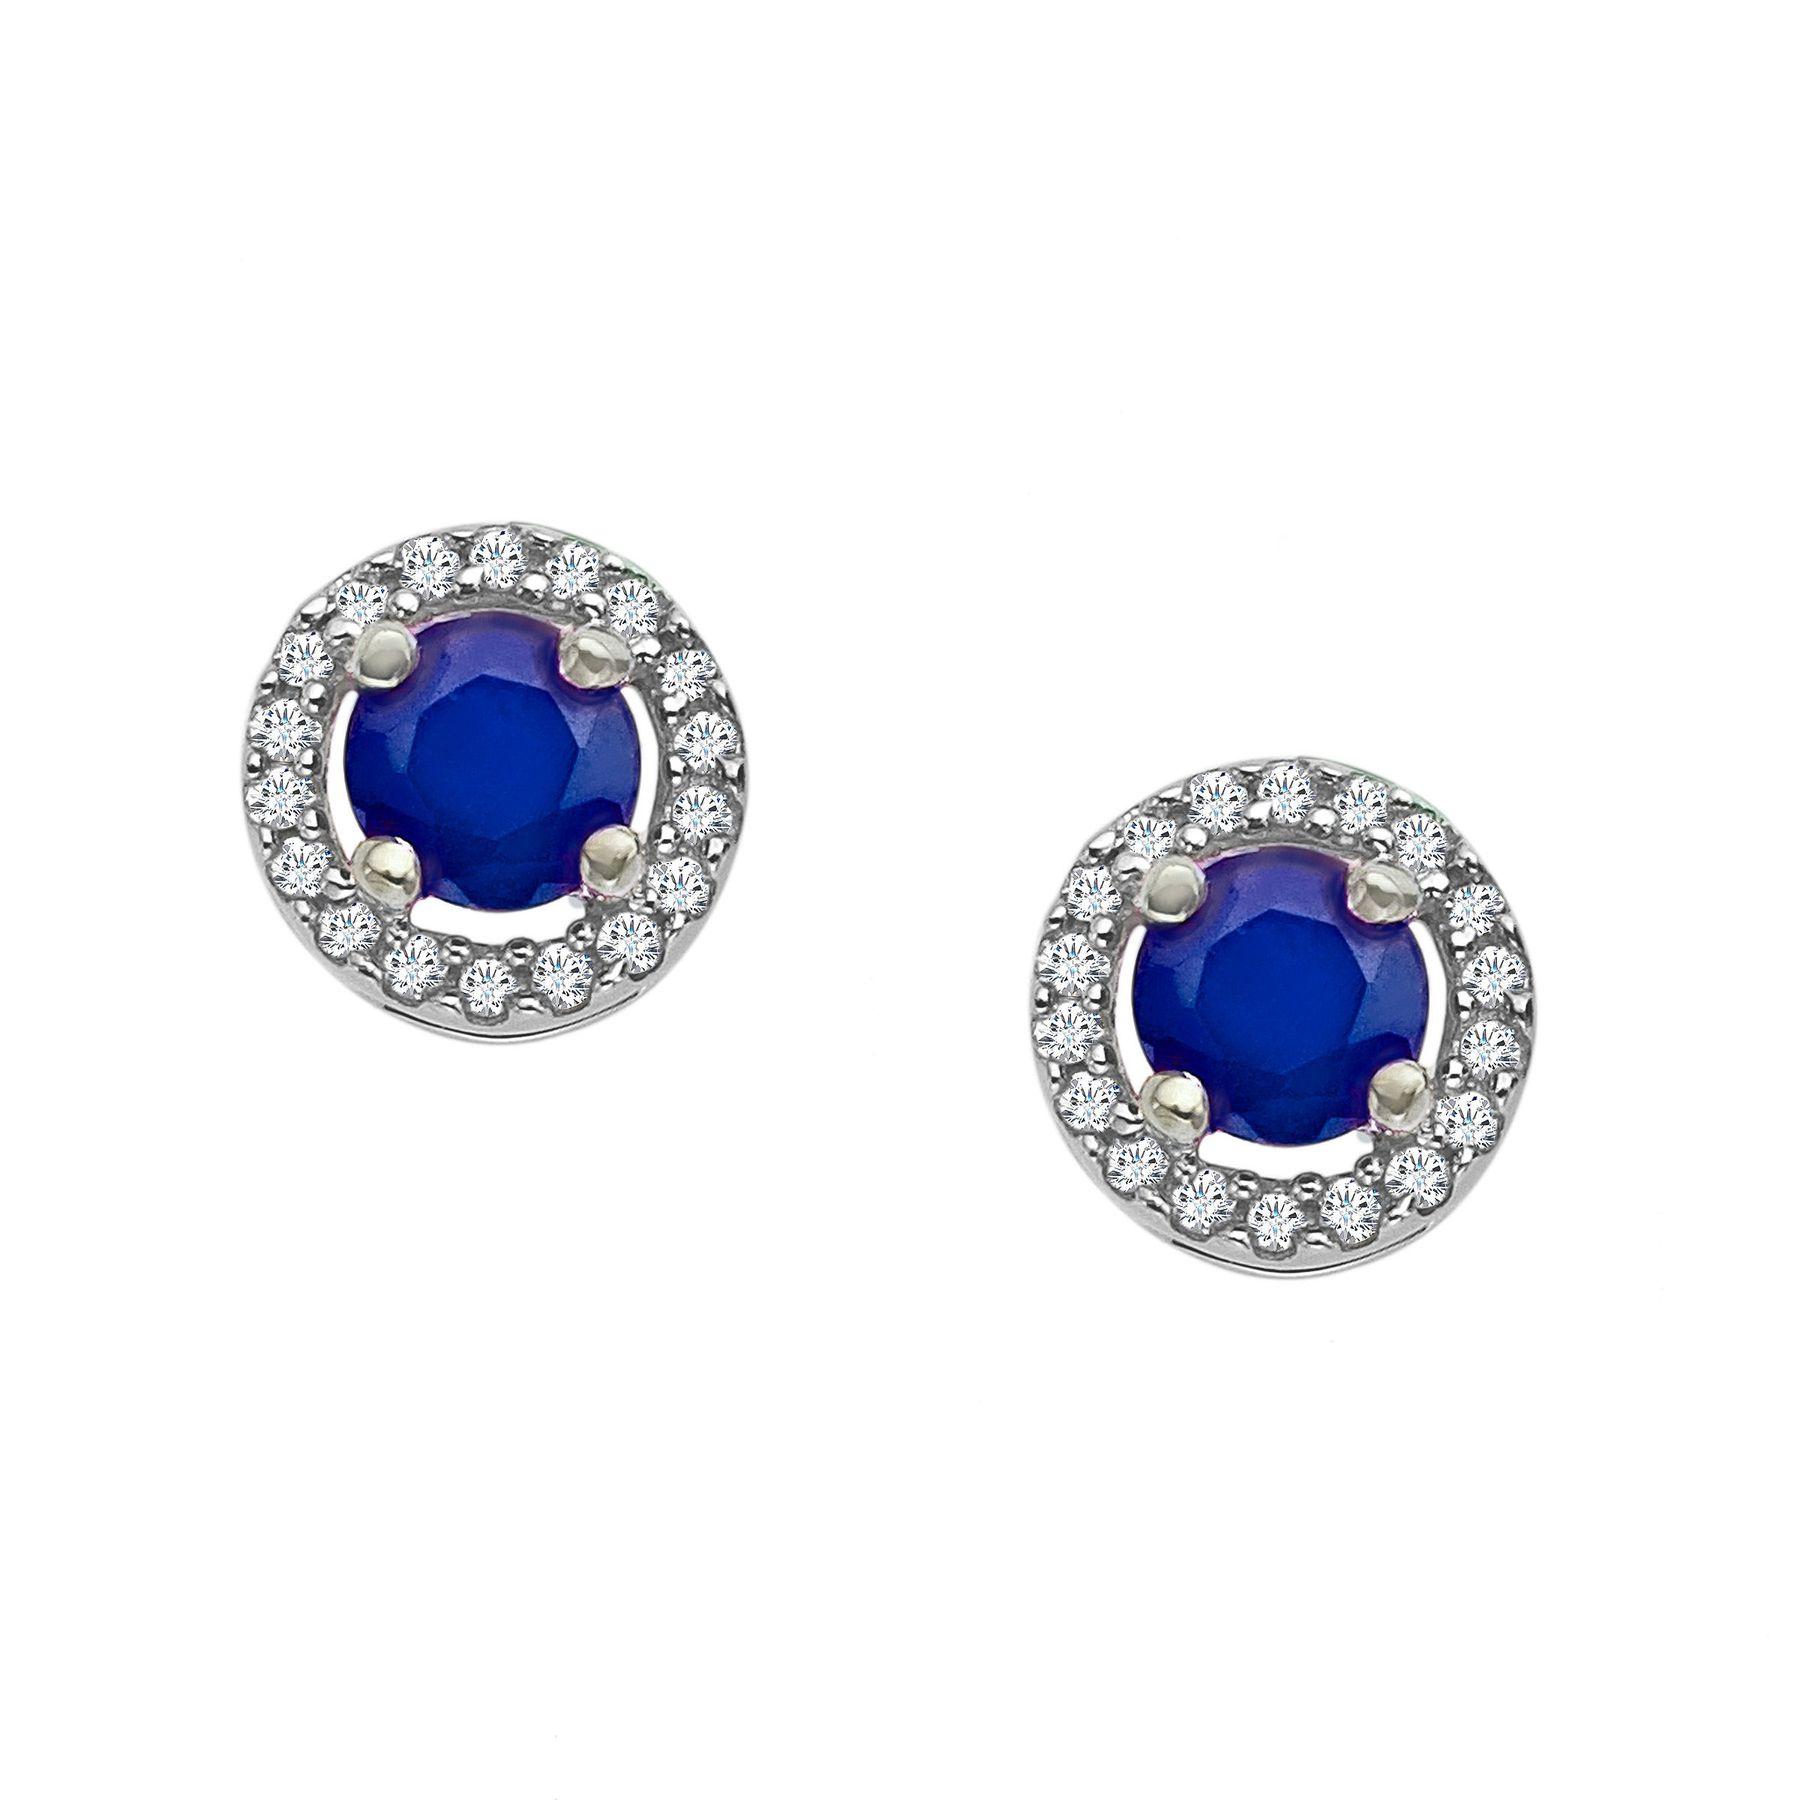 846f2fd1148f8 1/3 ct Sapphire & 1/10 ct Diamond Stud Earrings in 10K White Gold